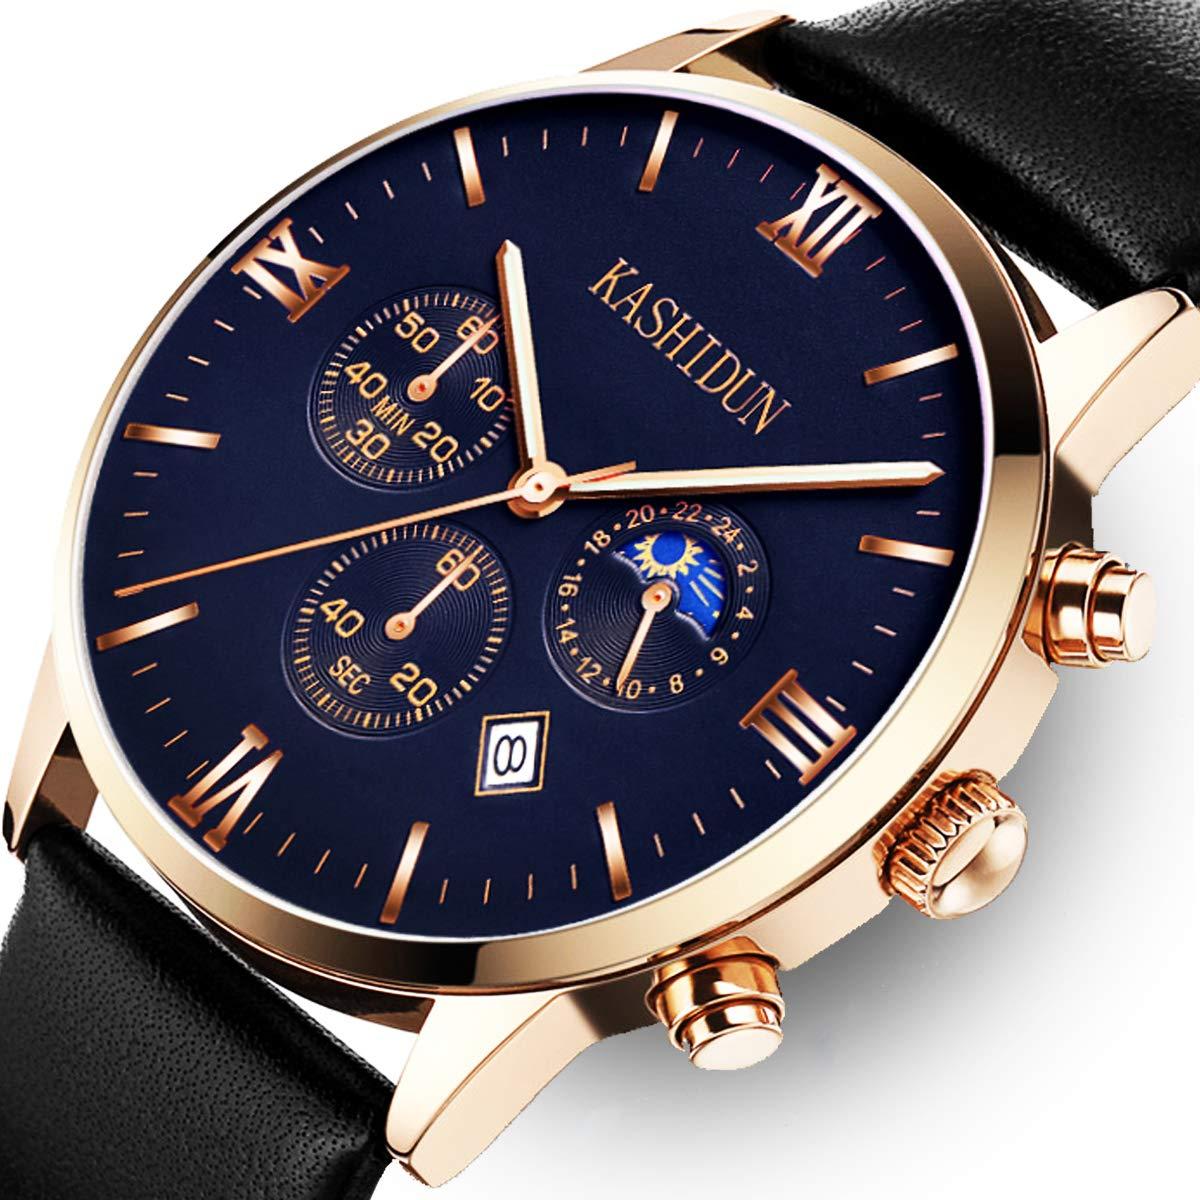 KASHIDUN Men's Watches Luxury Sports Casual Quartz Analog Waterproof Wrist Watch Black Color